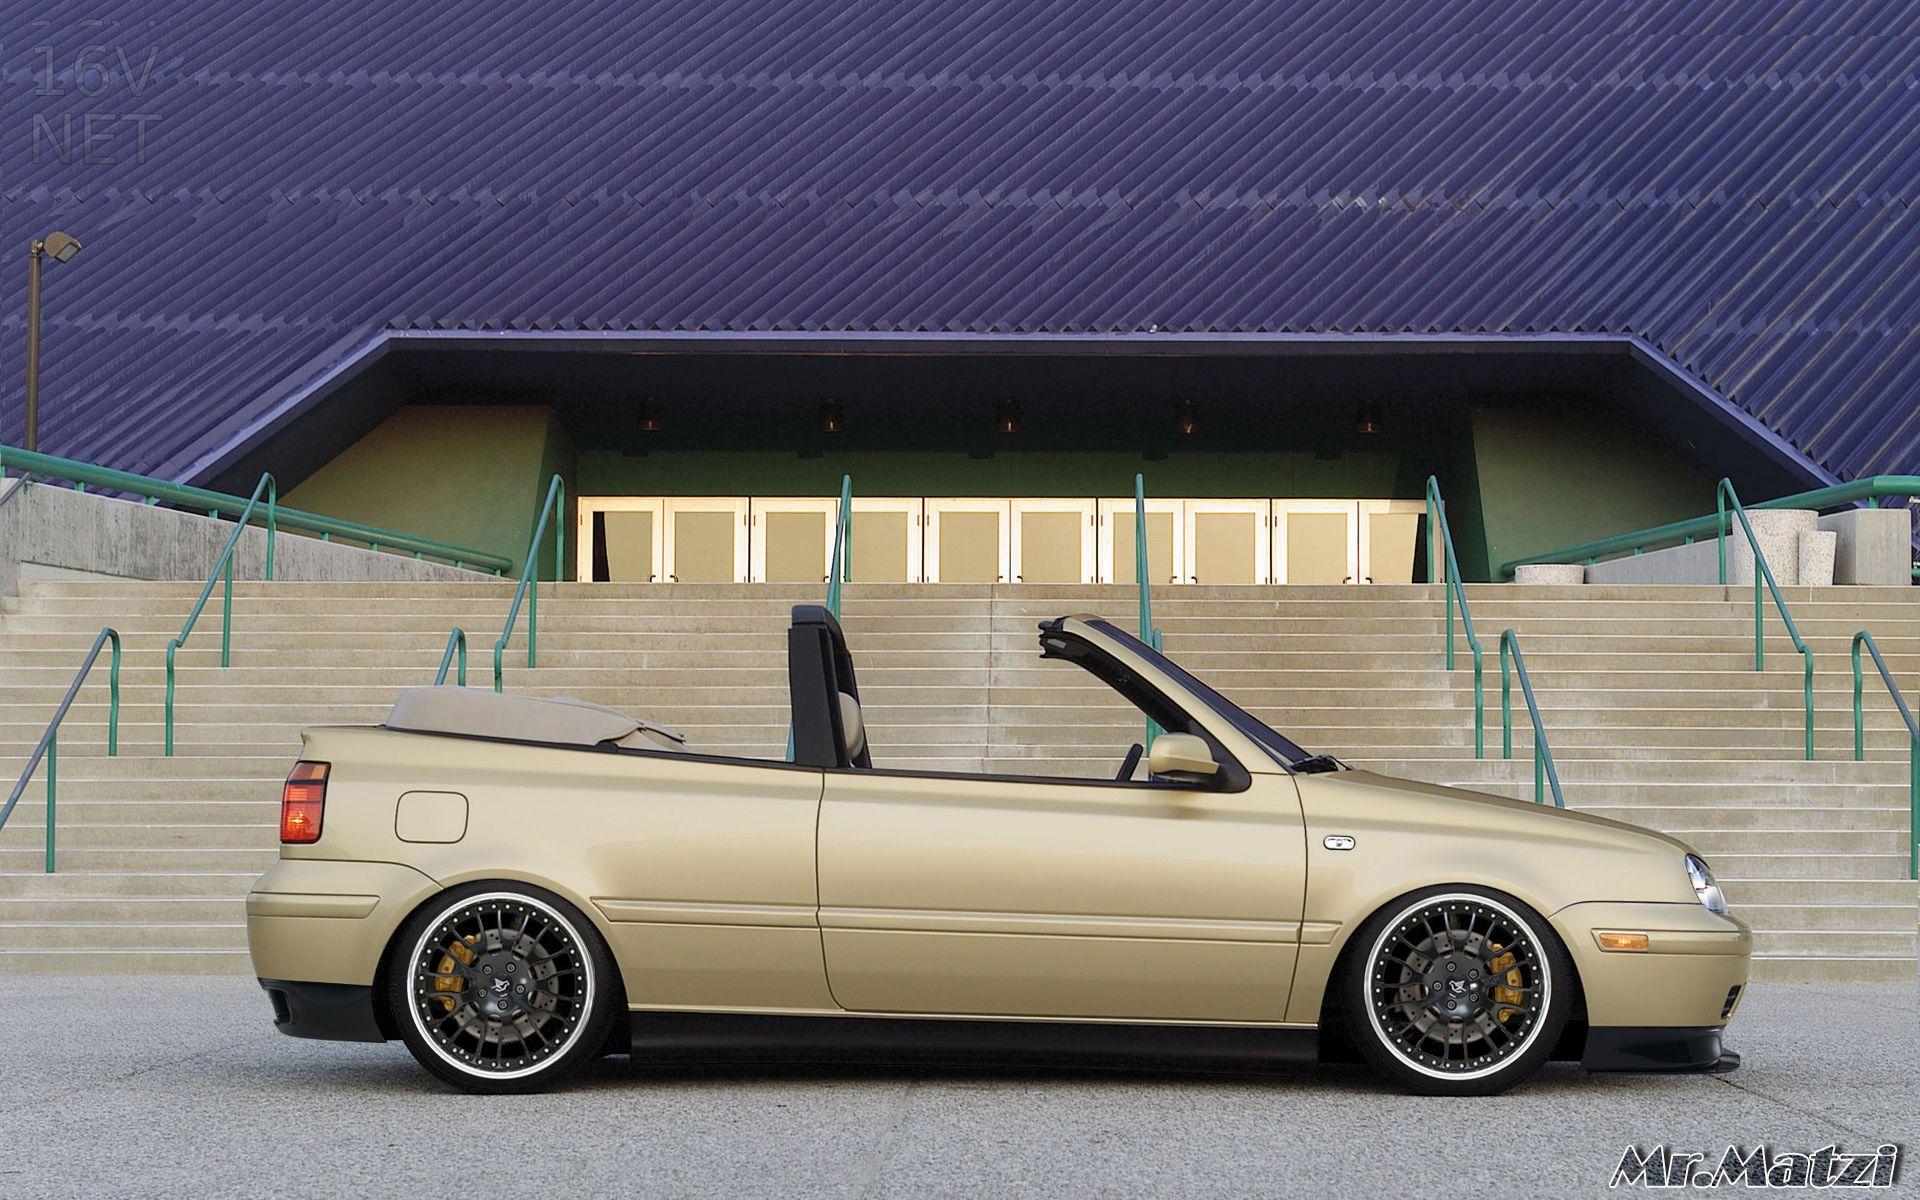 afbeeldingsresultaat voor golf 4 cabriolet tuning mk4 vw golf cabrio golf 4 golf. Black Bedroom Furniture Sets. Home Design Ideas